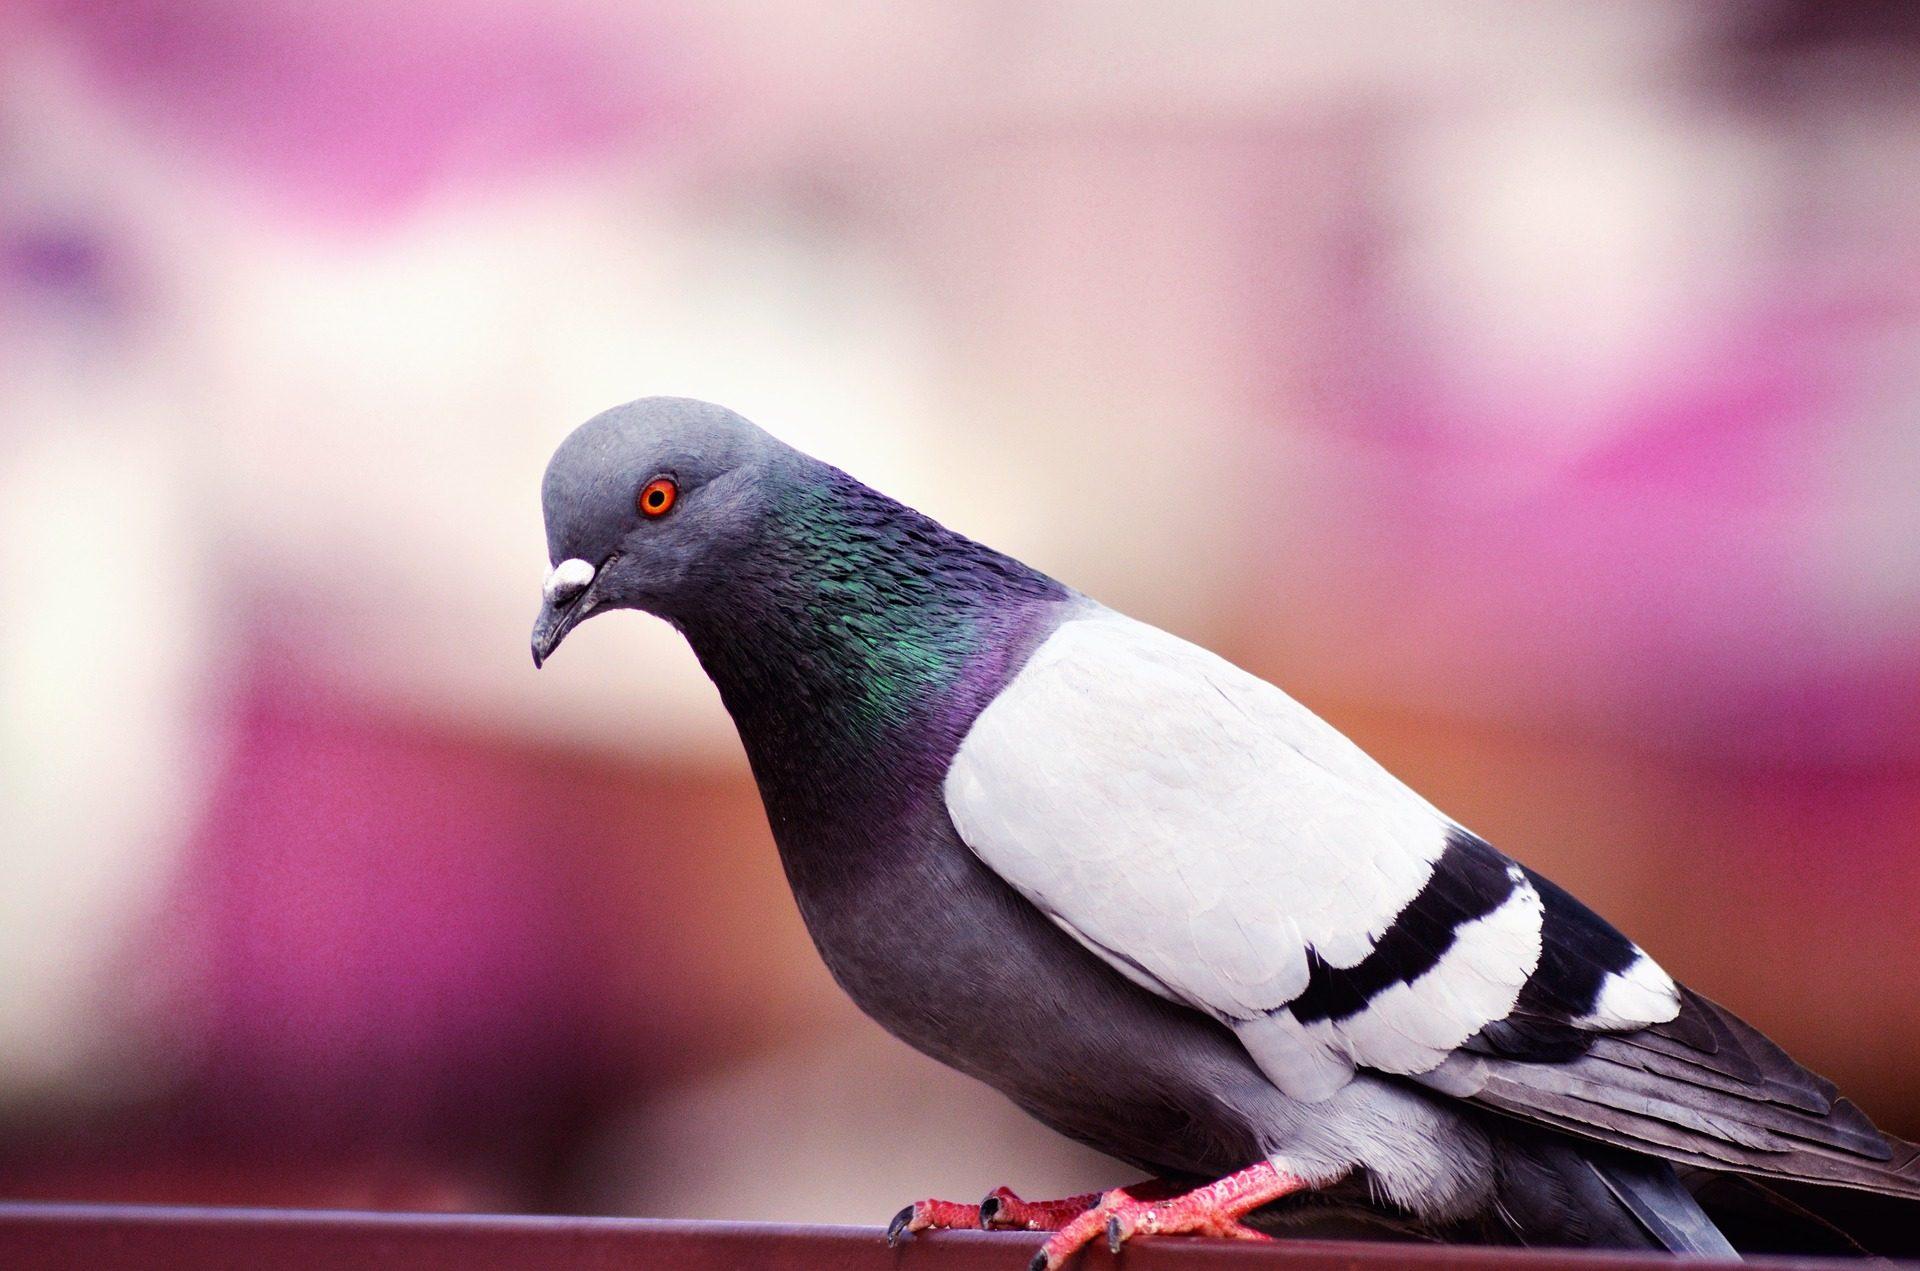 paloma, ave, pájaro, plumaje, colorido, mirada - Fondos de Pantalla HD - professor-falken.com